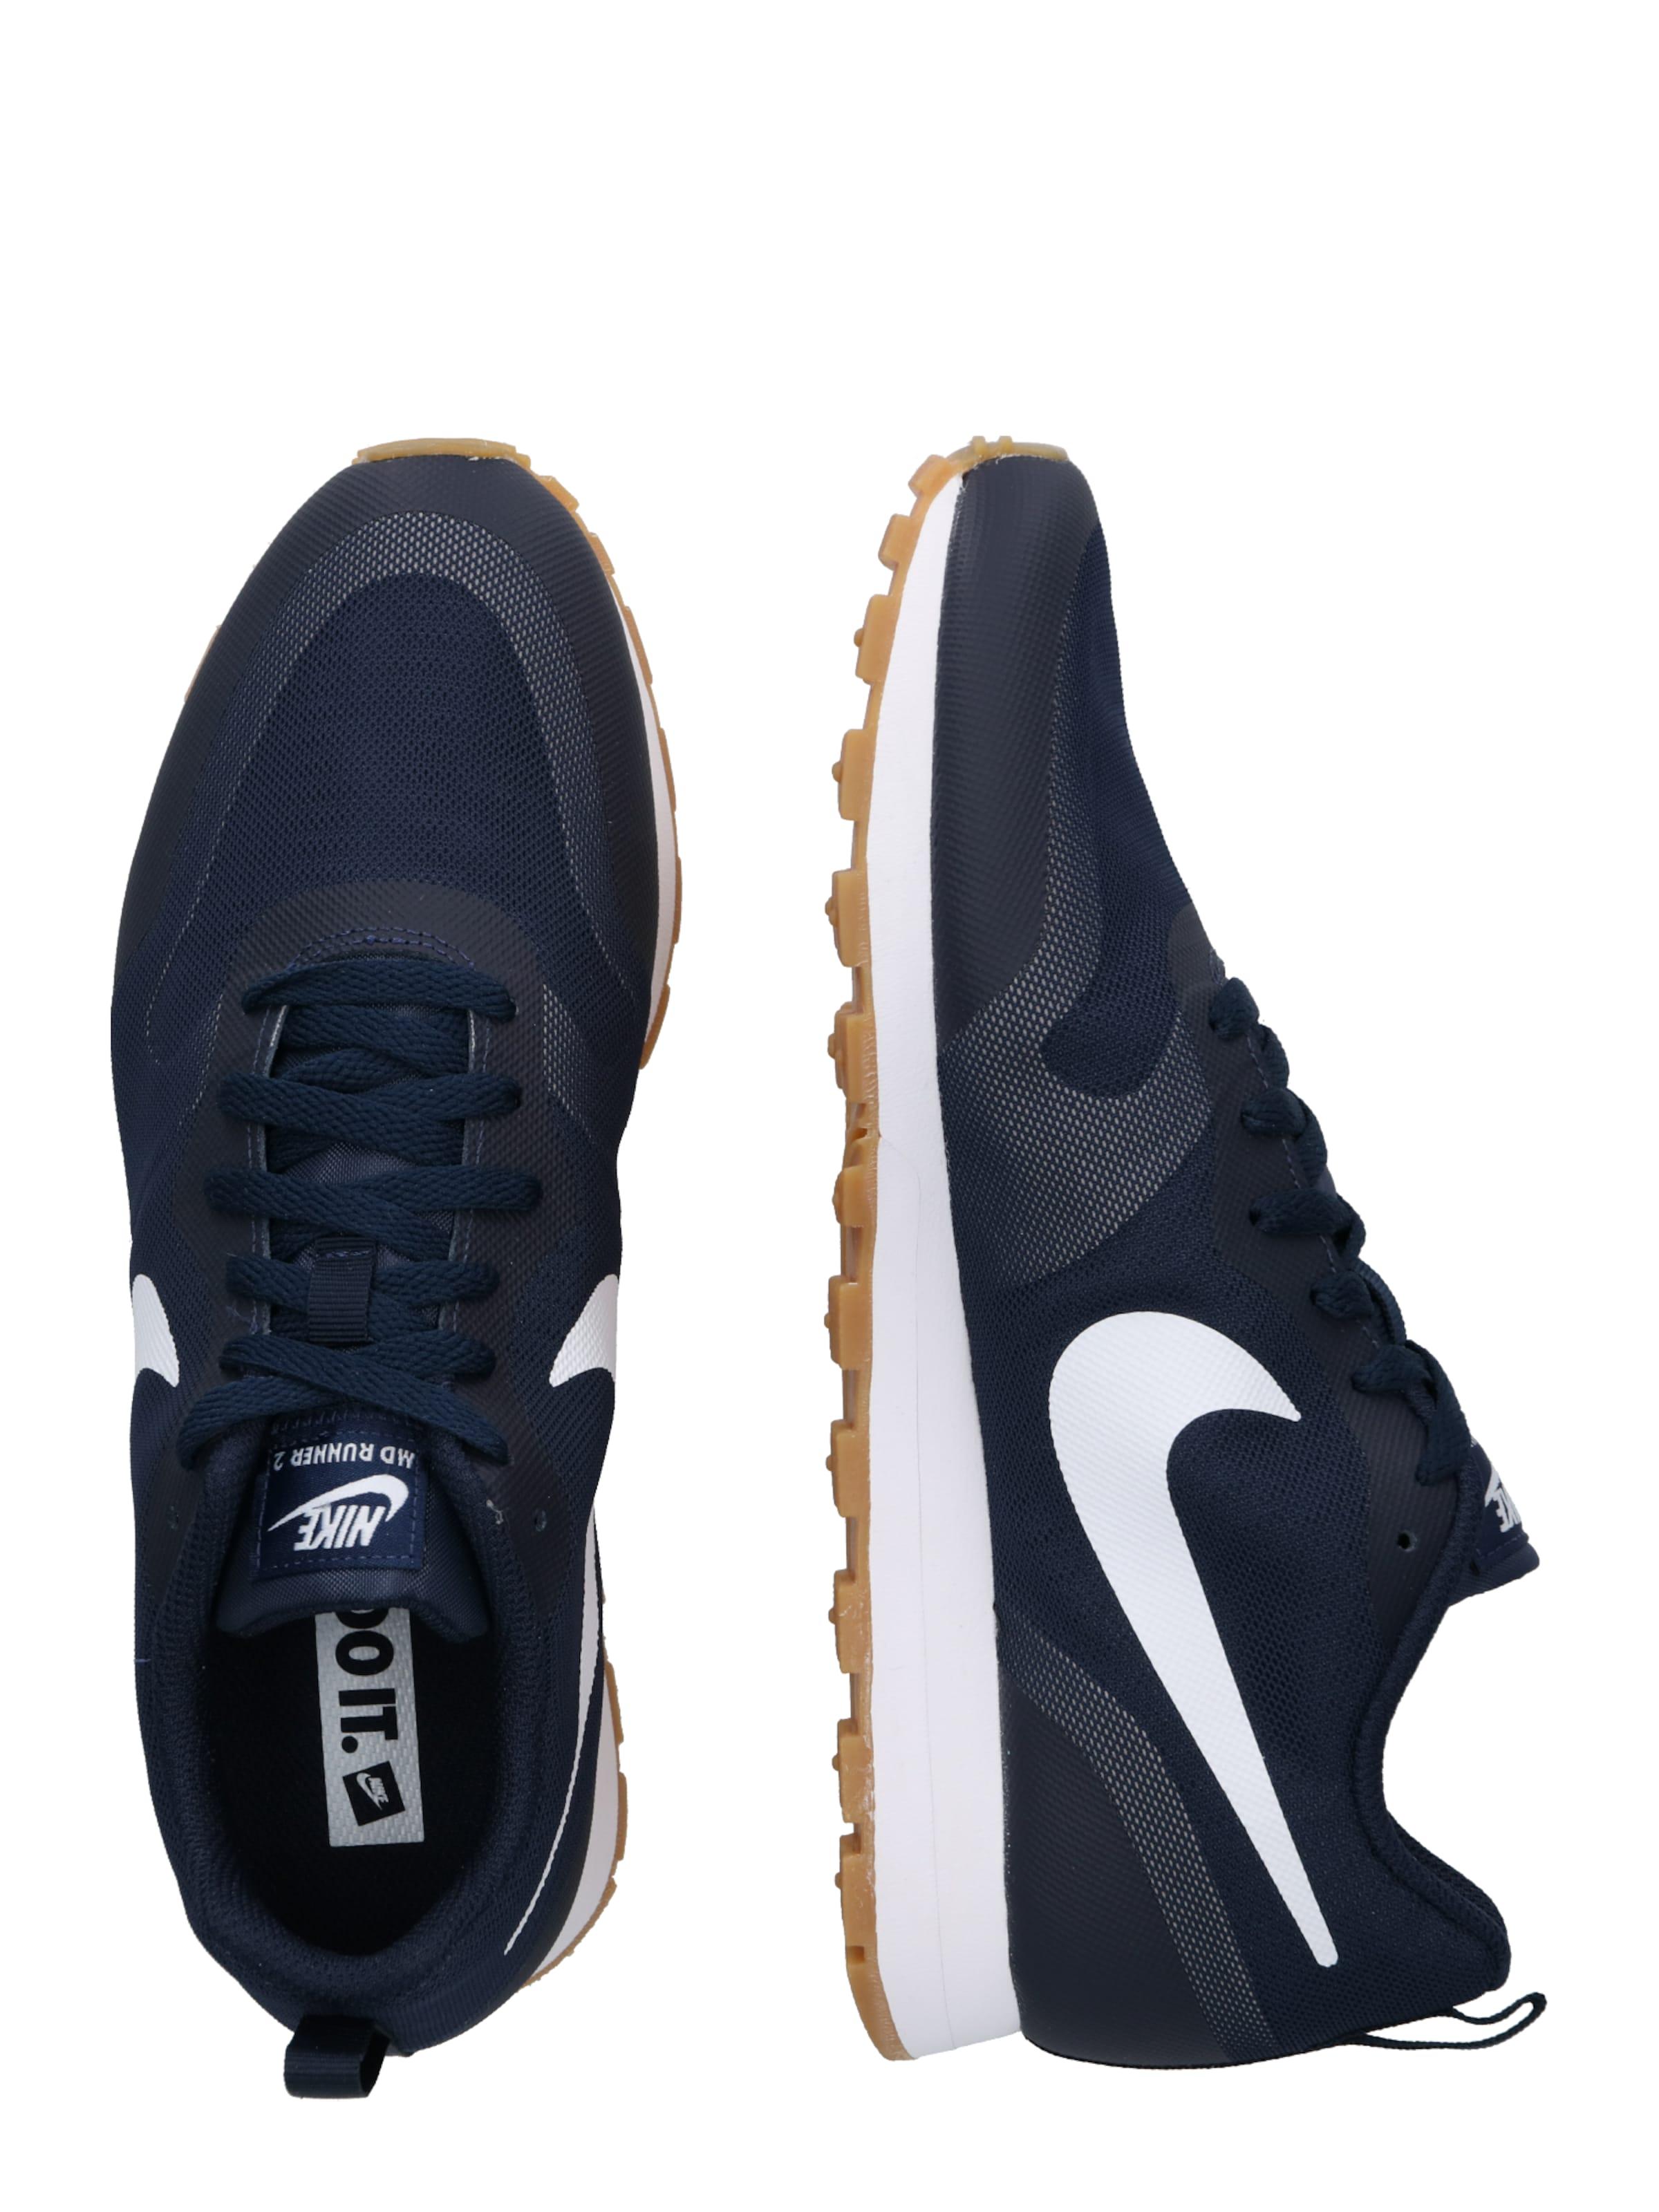 'md Basses Runner Baskets 2 Nike 19' En Bleu Sportswear MarineBlanc 54RjLAq3